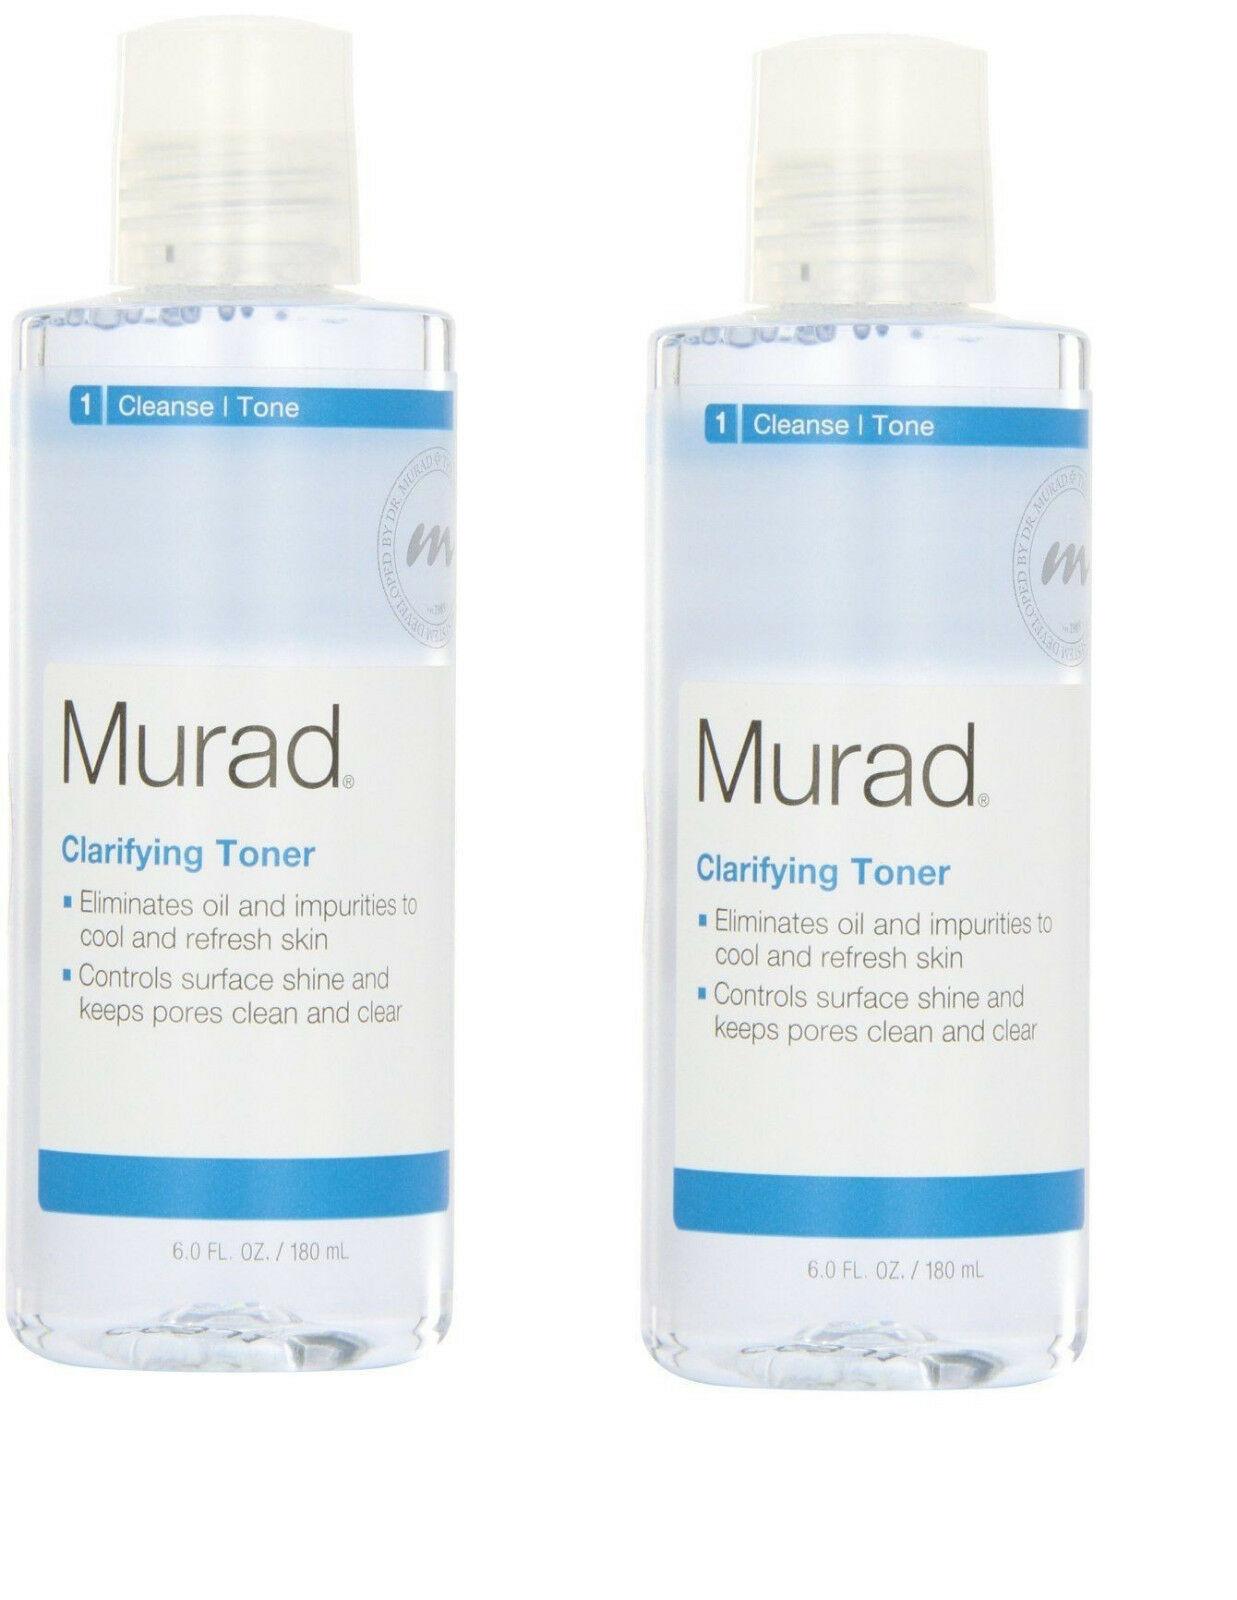 2- Murad Clarifying Toner Step 1 Cleanse/Tone 6 fl oz x 2  - $34.64